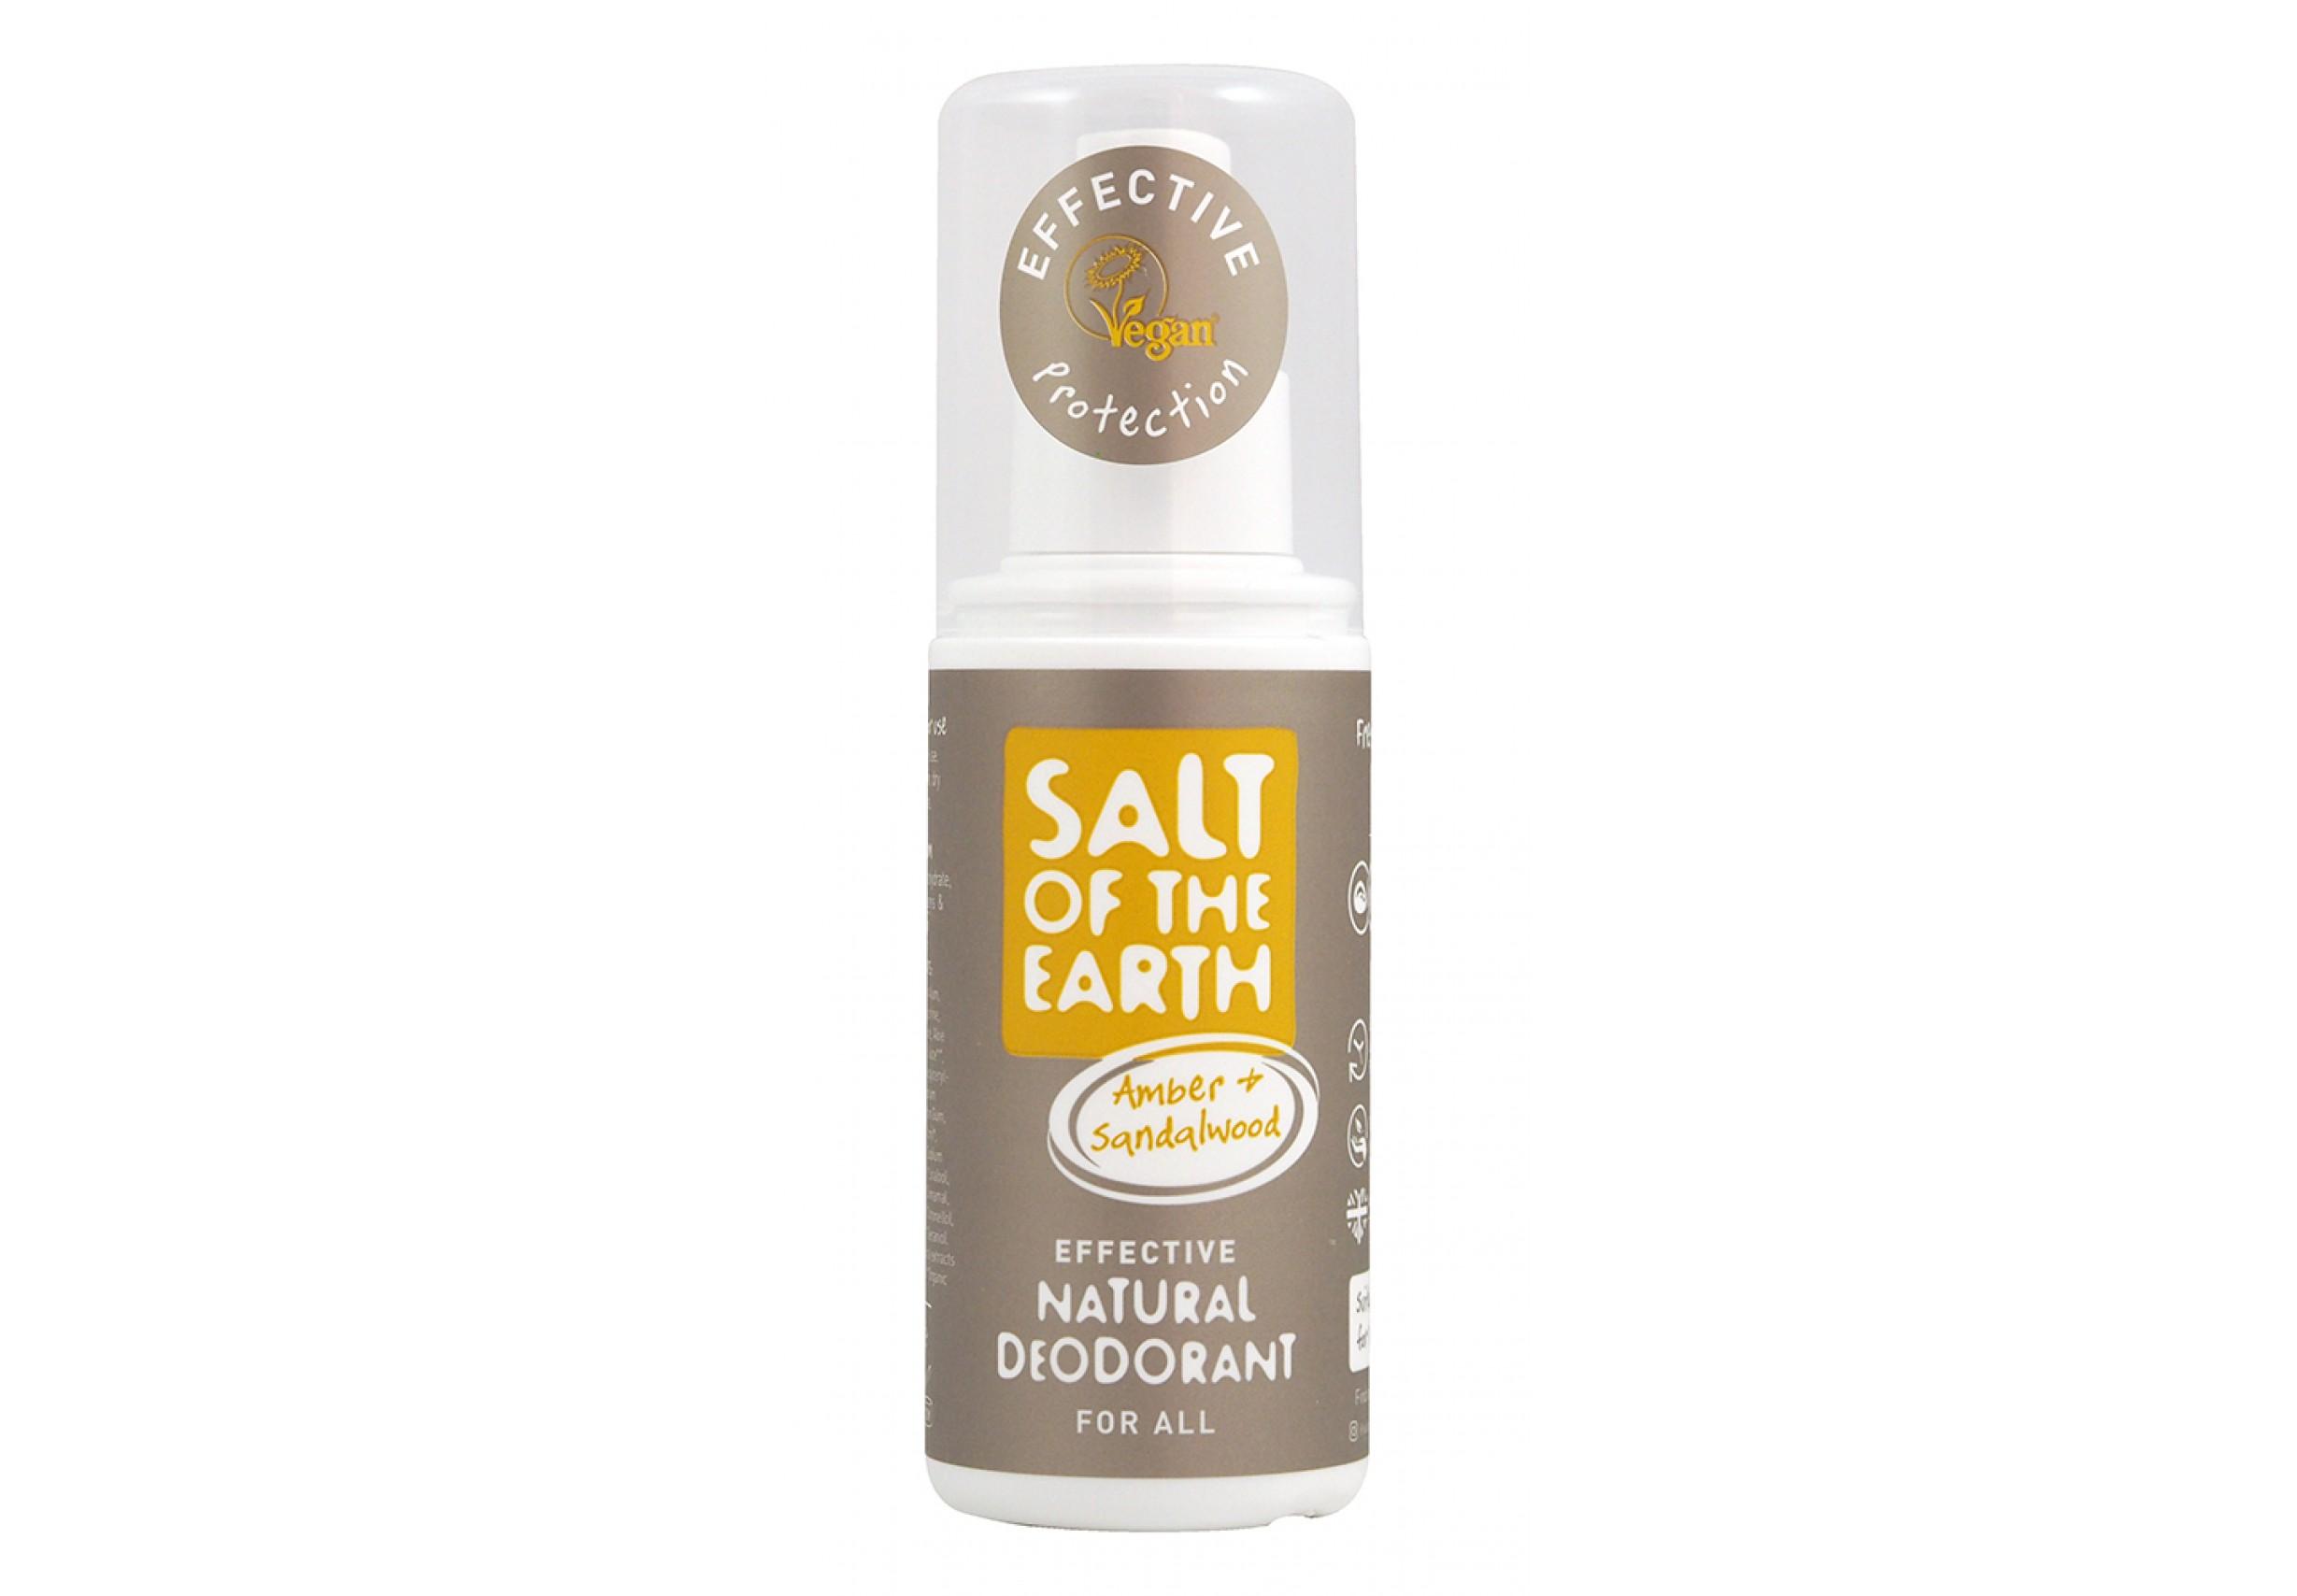 Amber & Sandalwood Natural Deodorant Spray